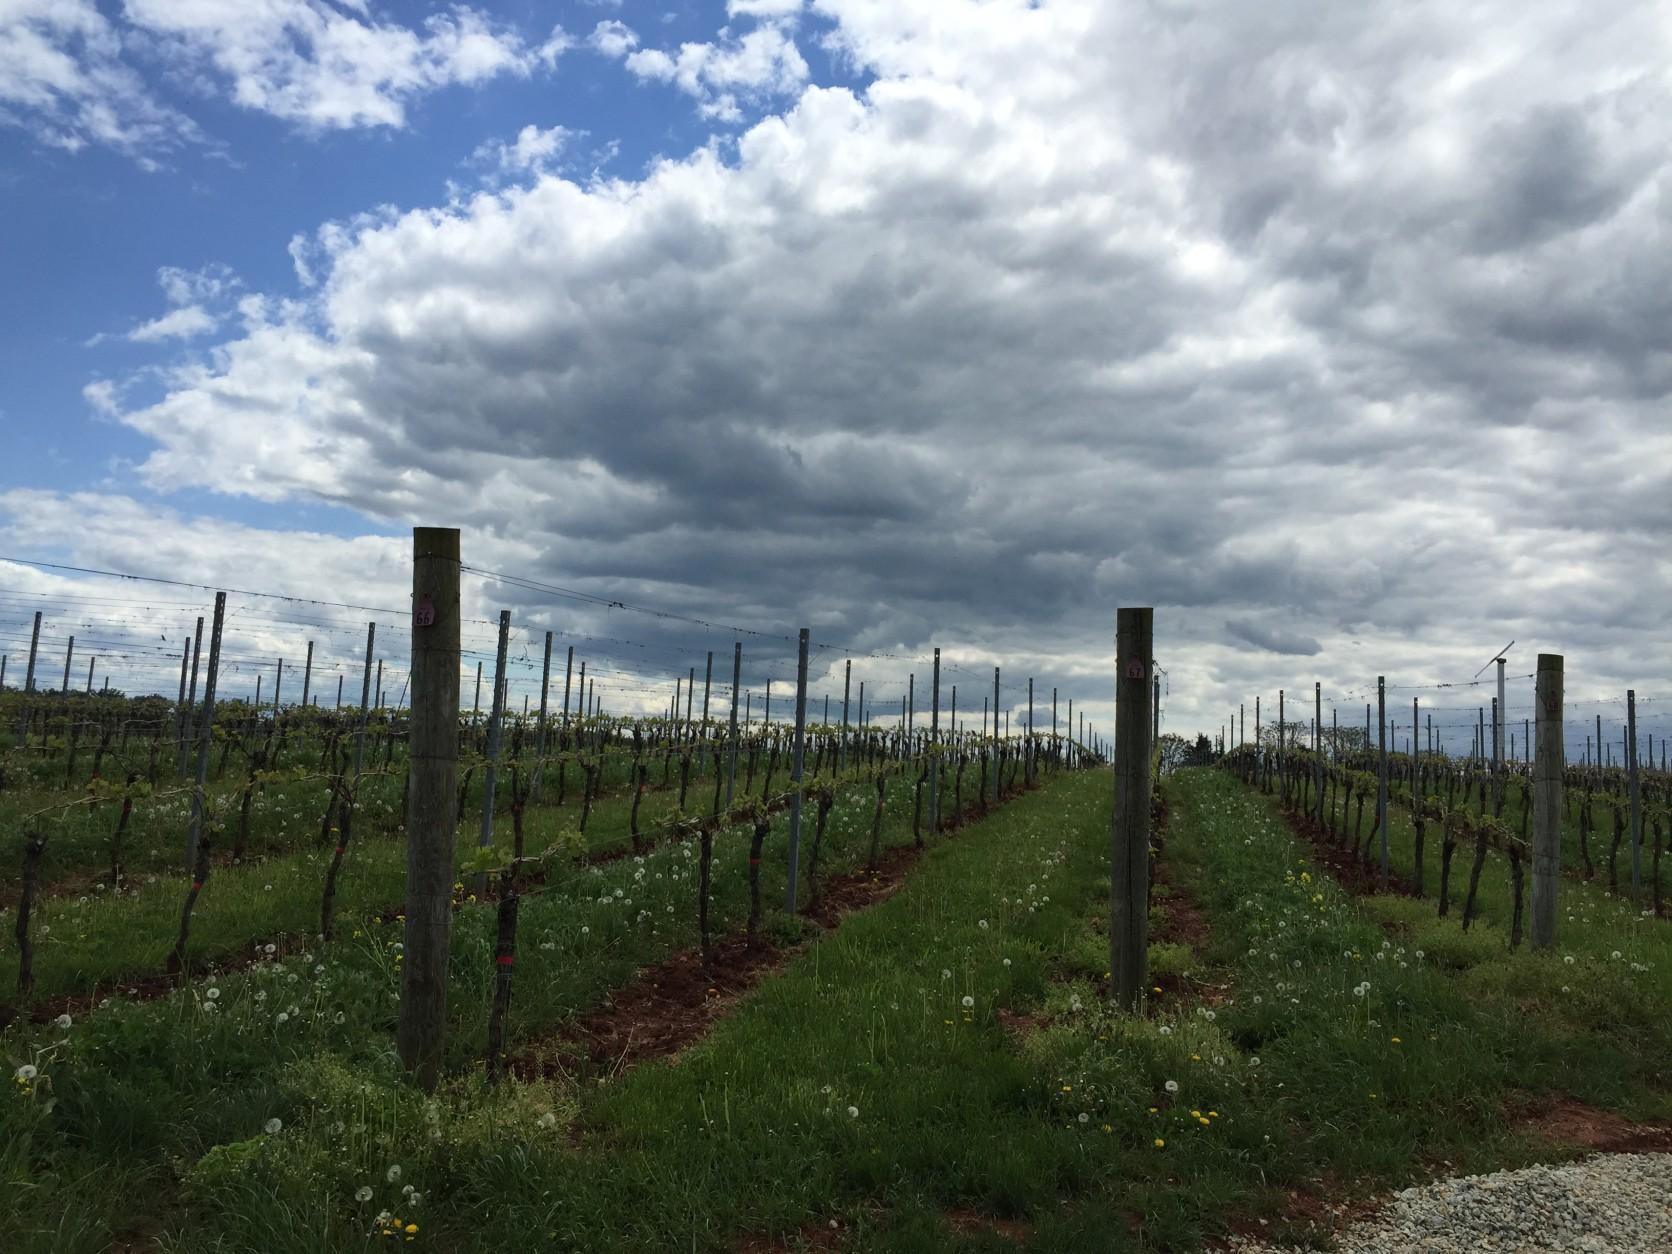 Steve Case's winery is a Wine Enthusiast finalist